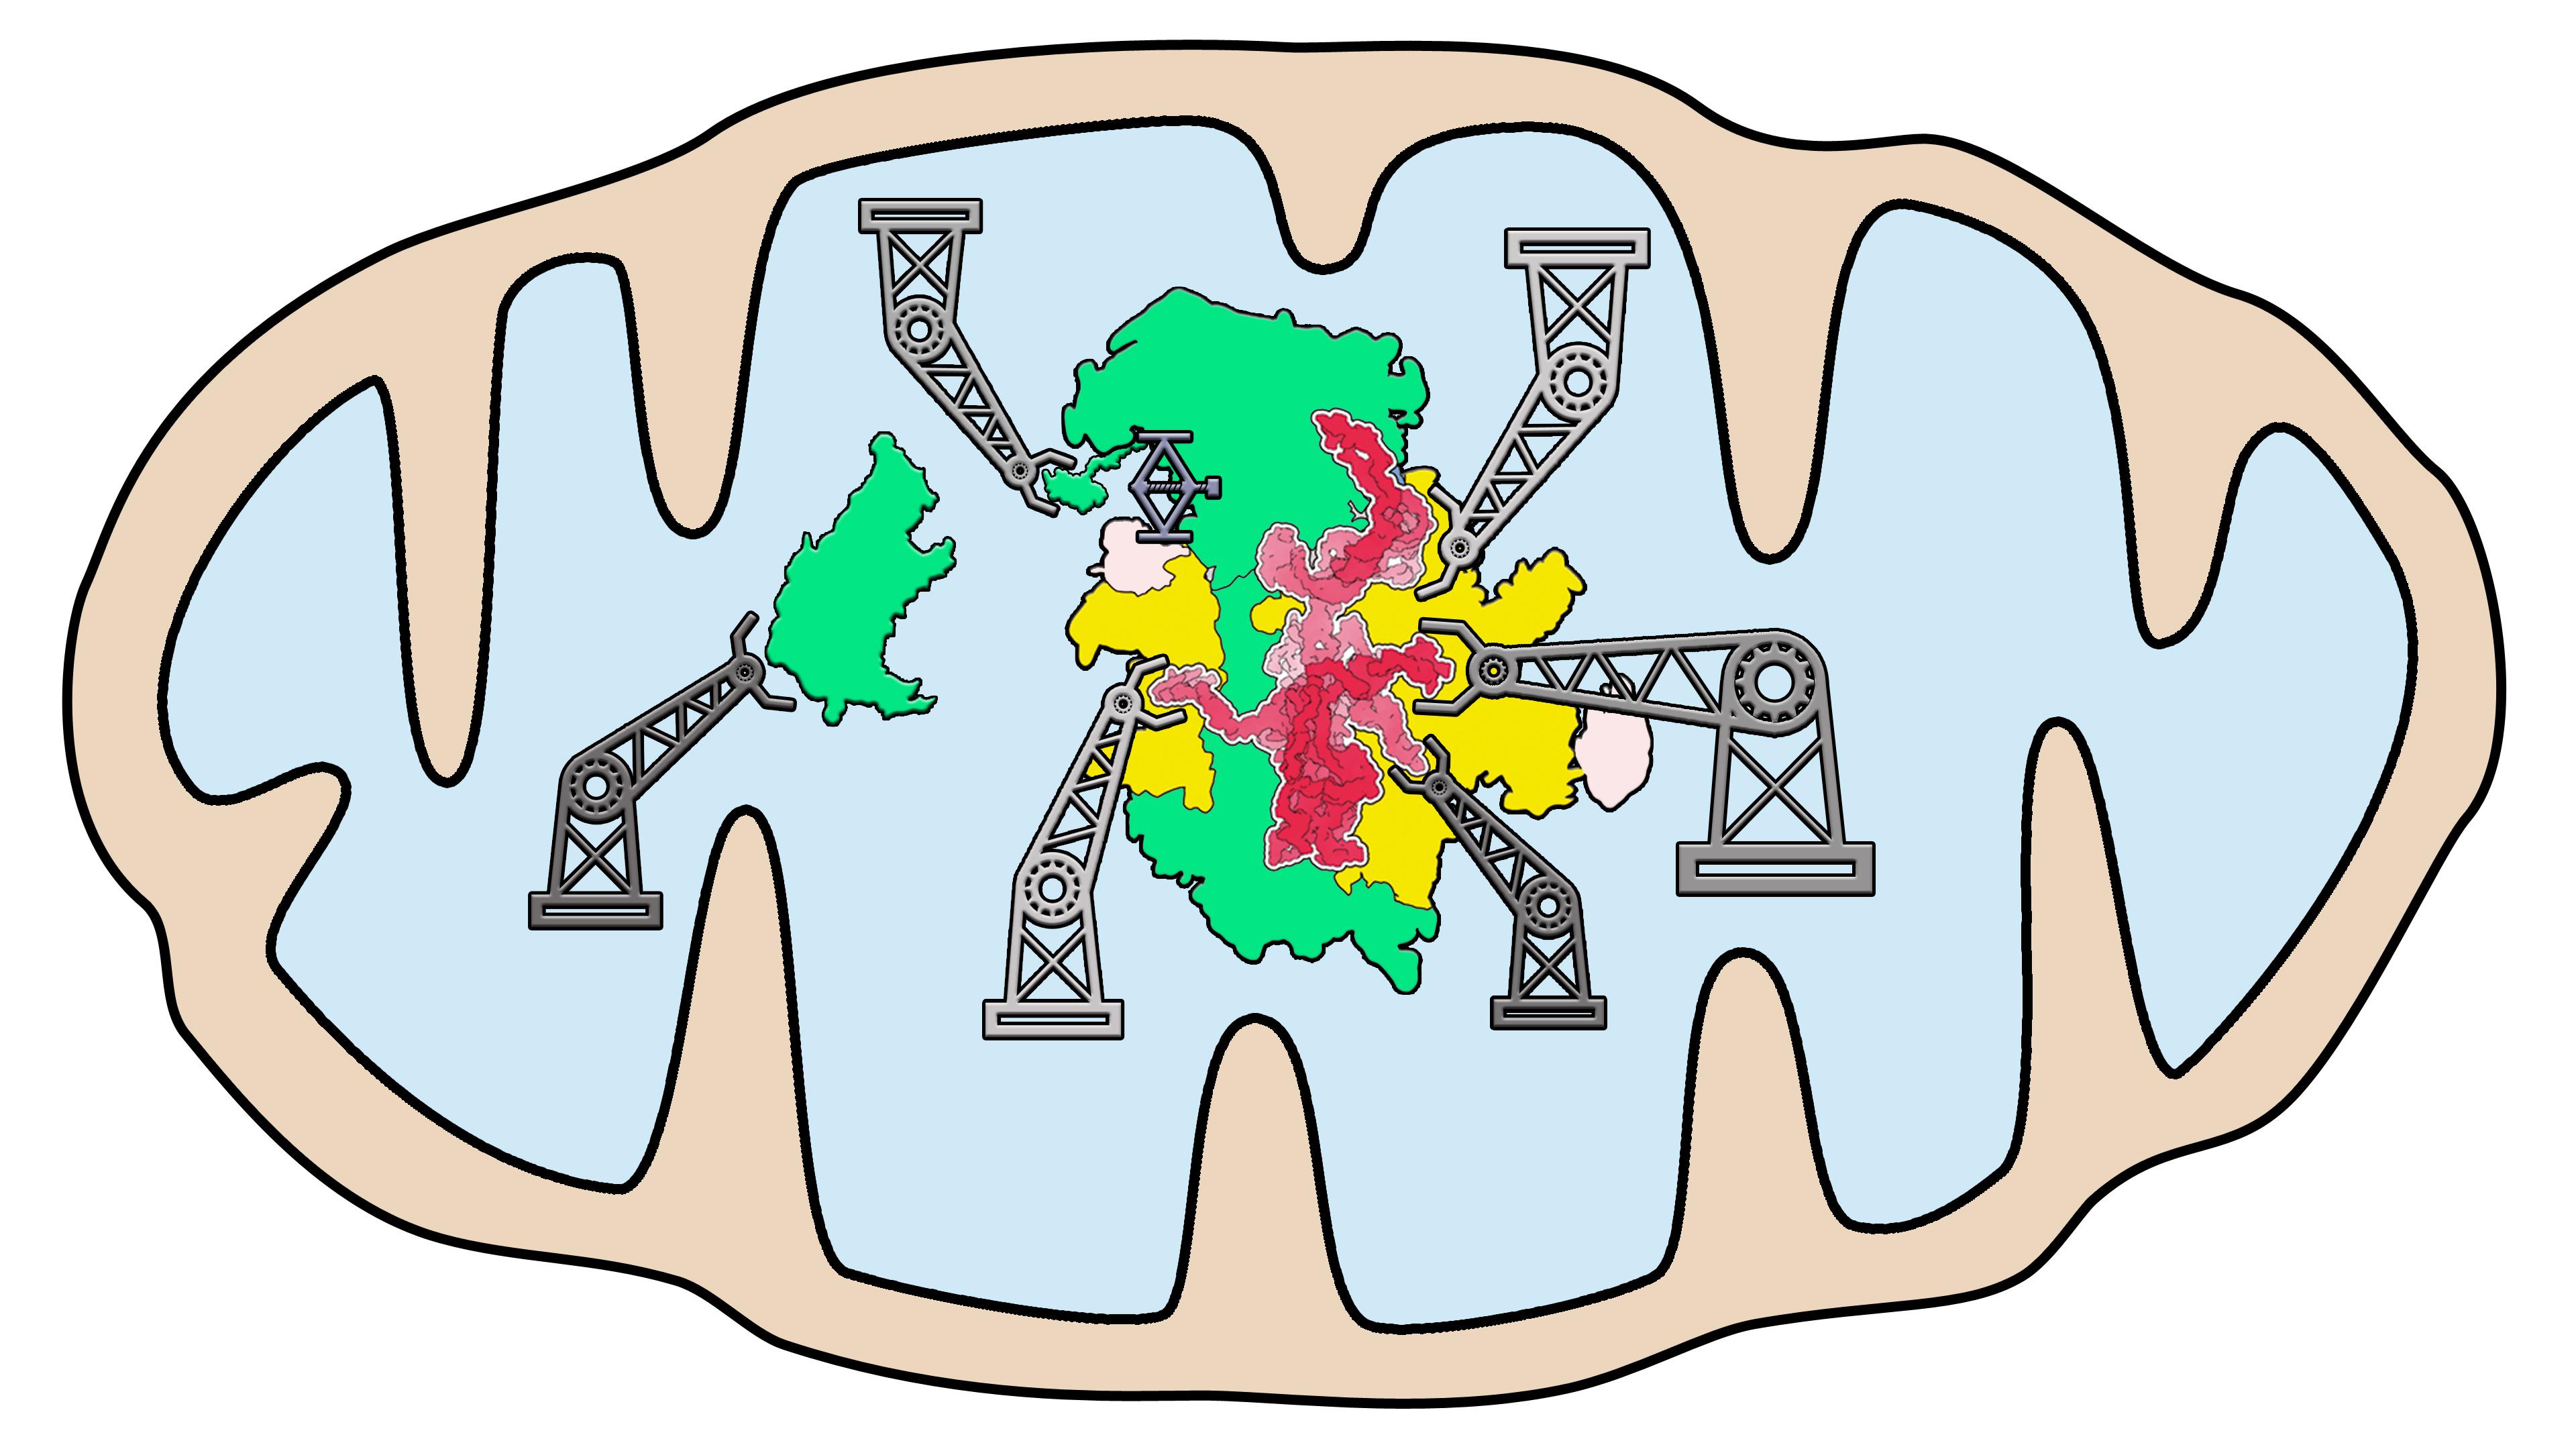 Modell des Montageprozesses von Mitorobosomen  im Parasiten Trypanosoma brucei.   Grafik: NCCR RNA & Disease